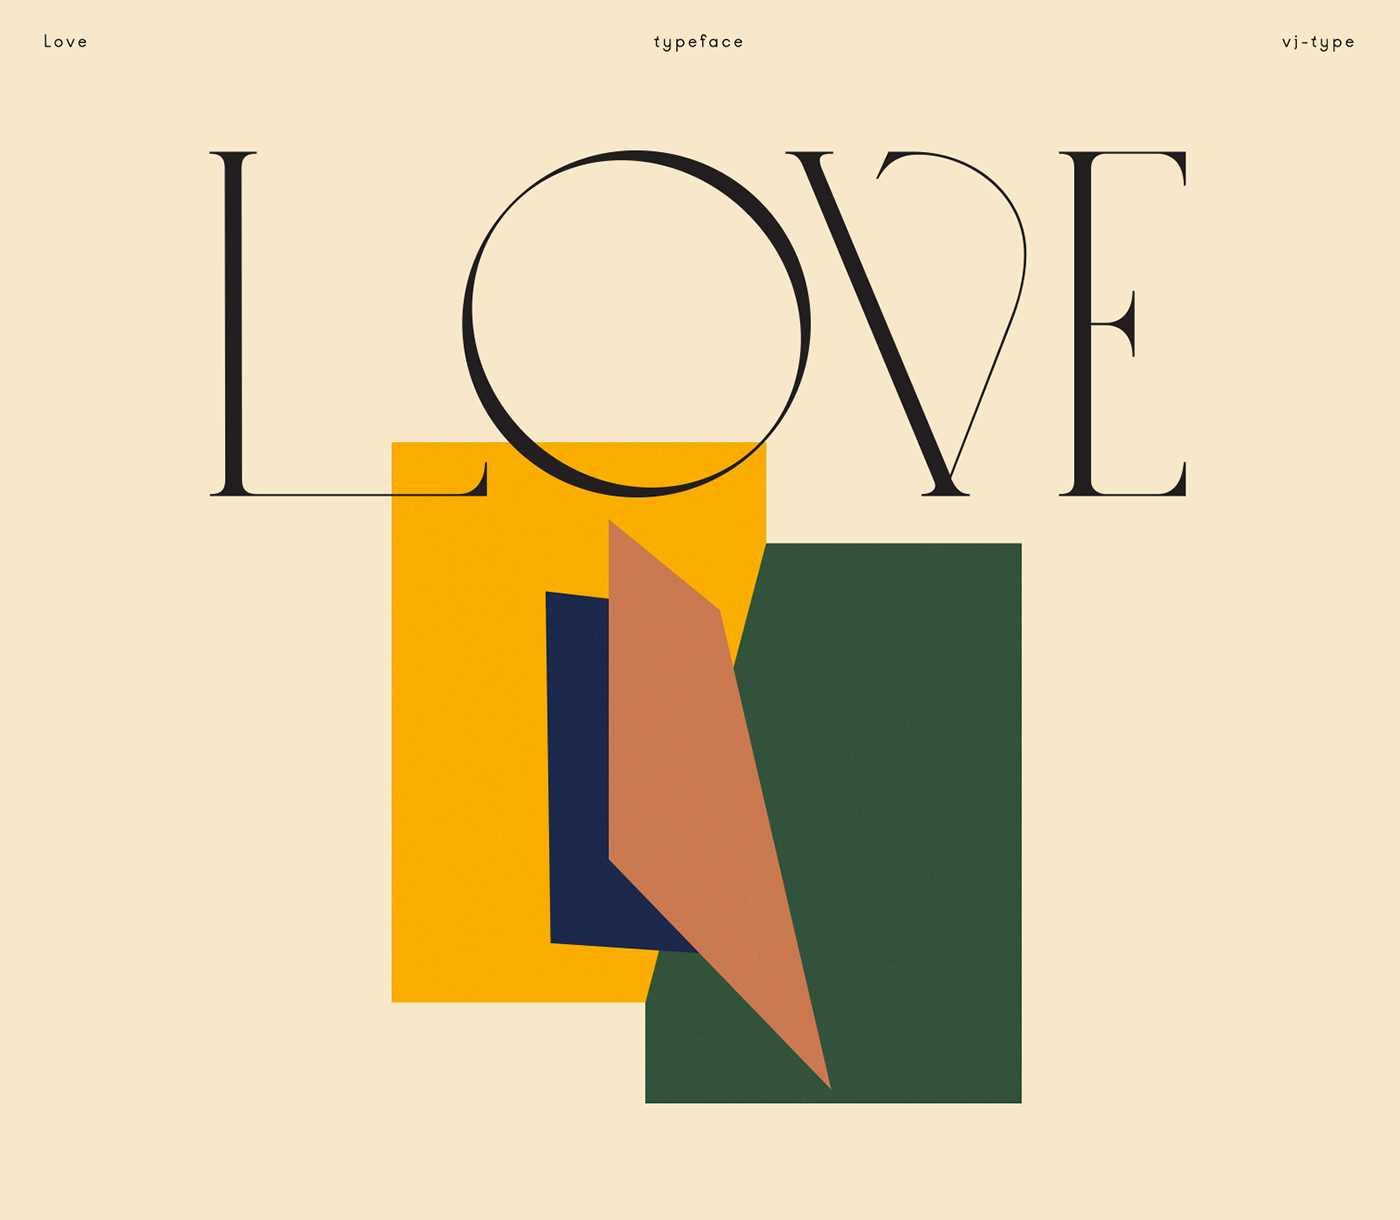 vj-type Violaine & Jeremy font type Typeface vj-type.com love font Love type serif typography